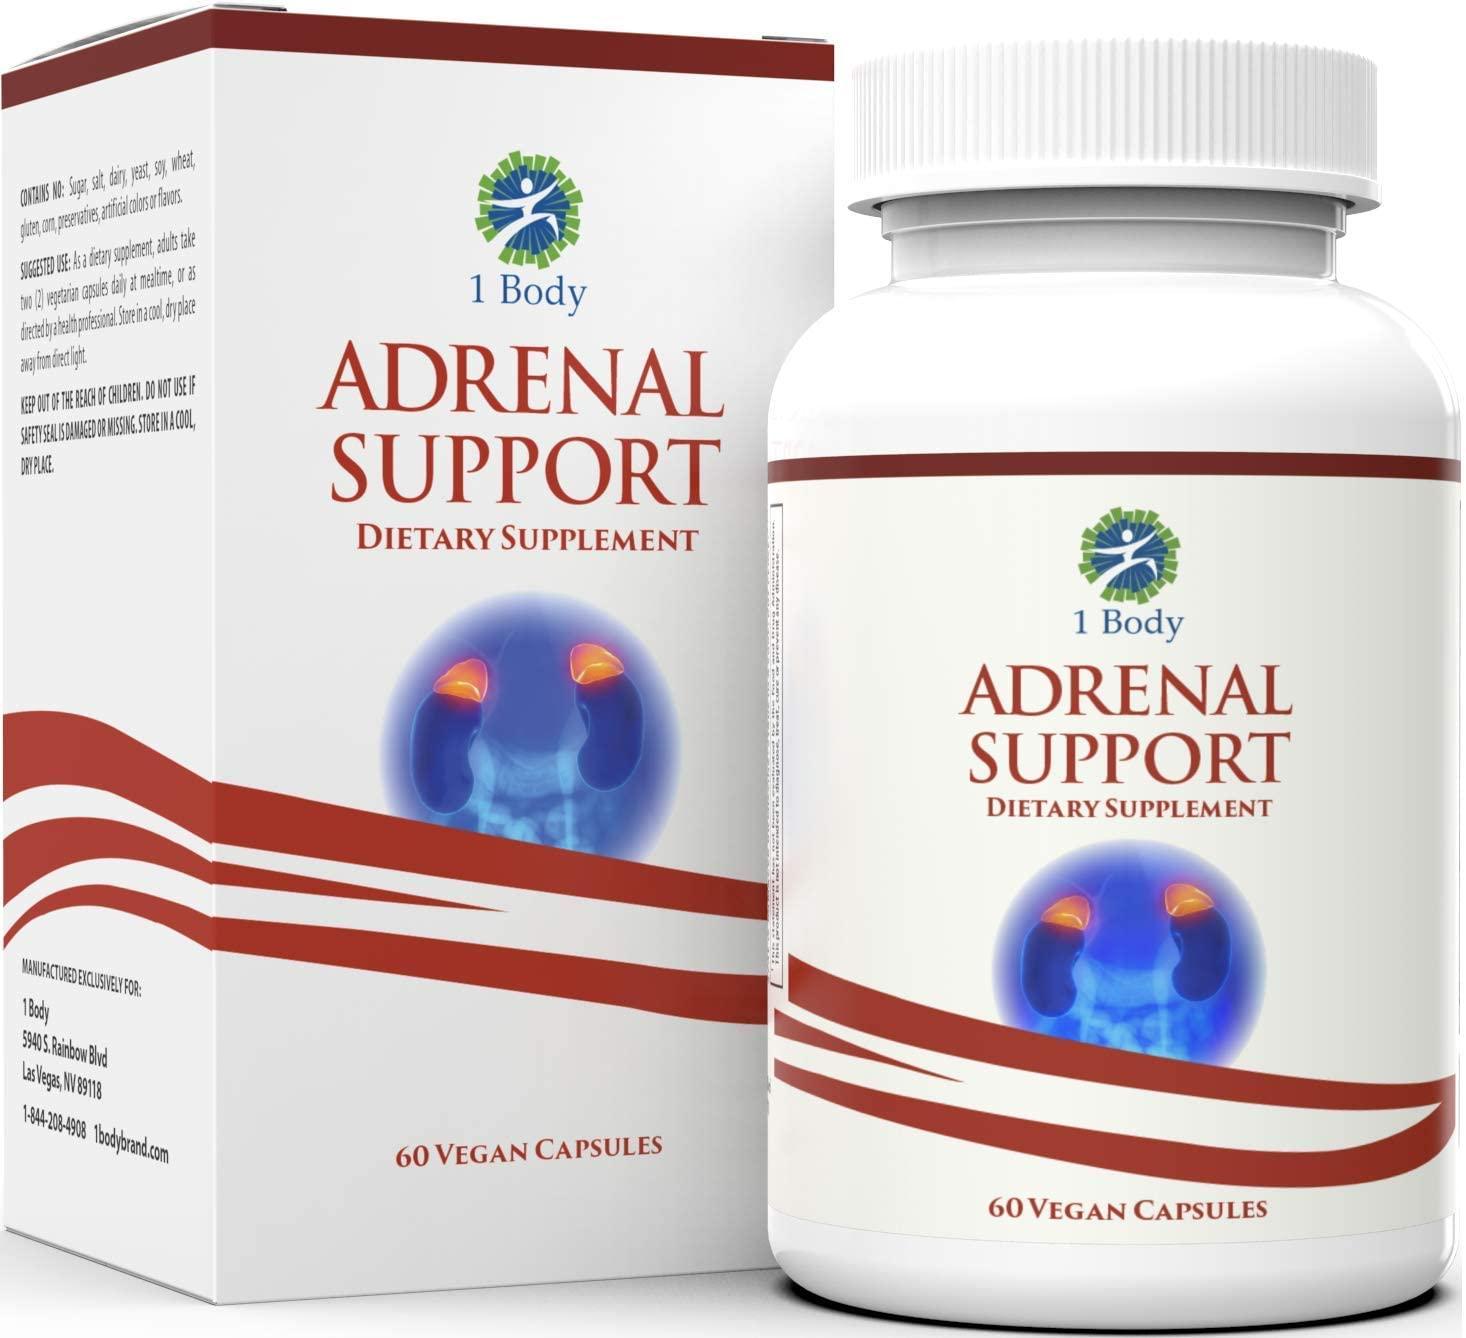 1 Body Addrenal Support